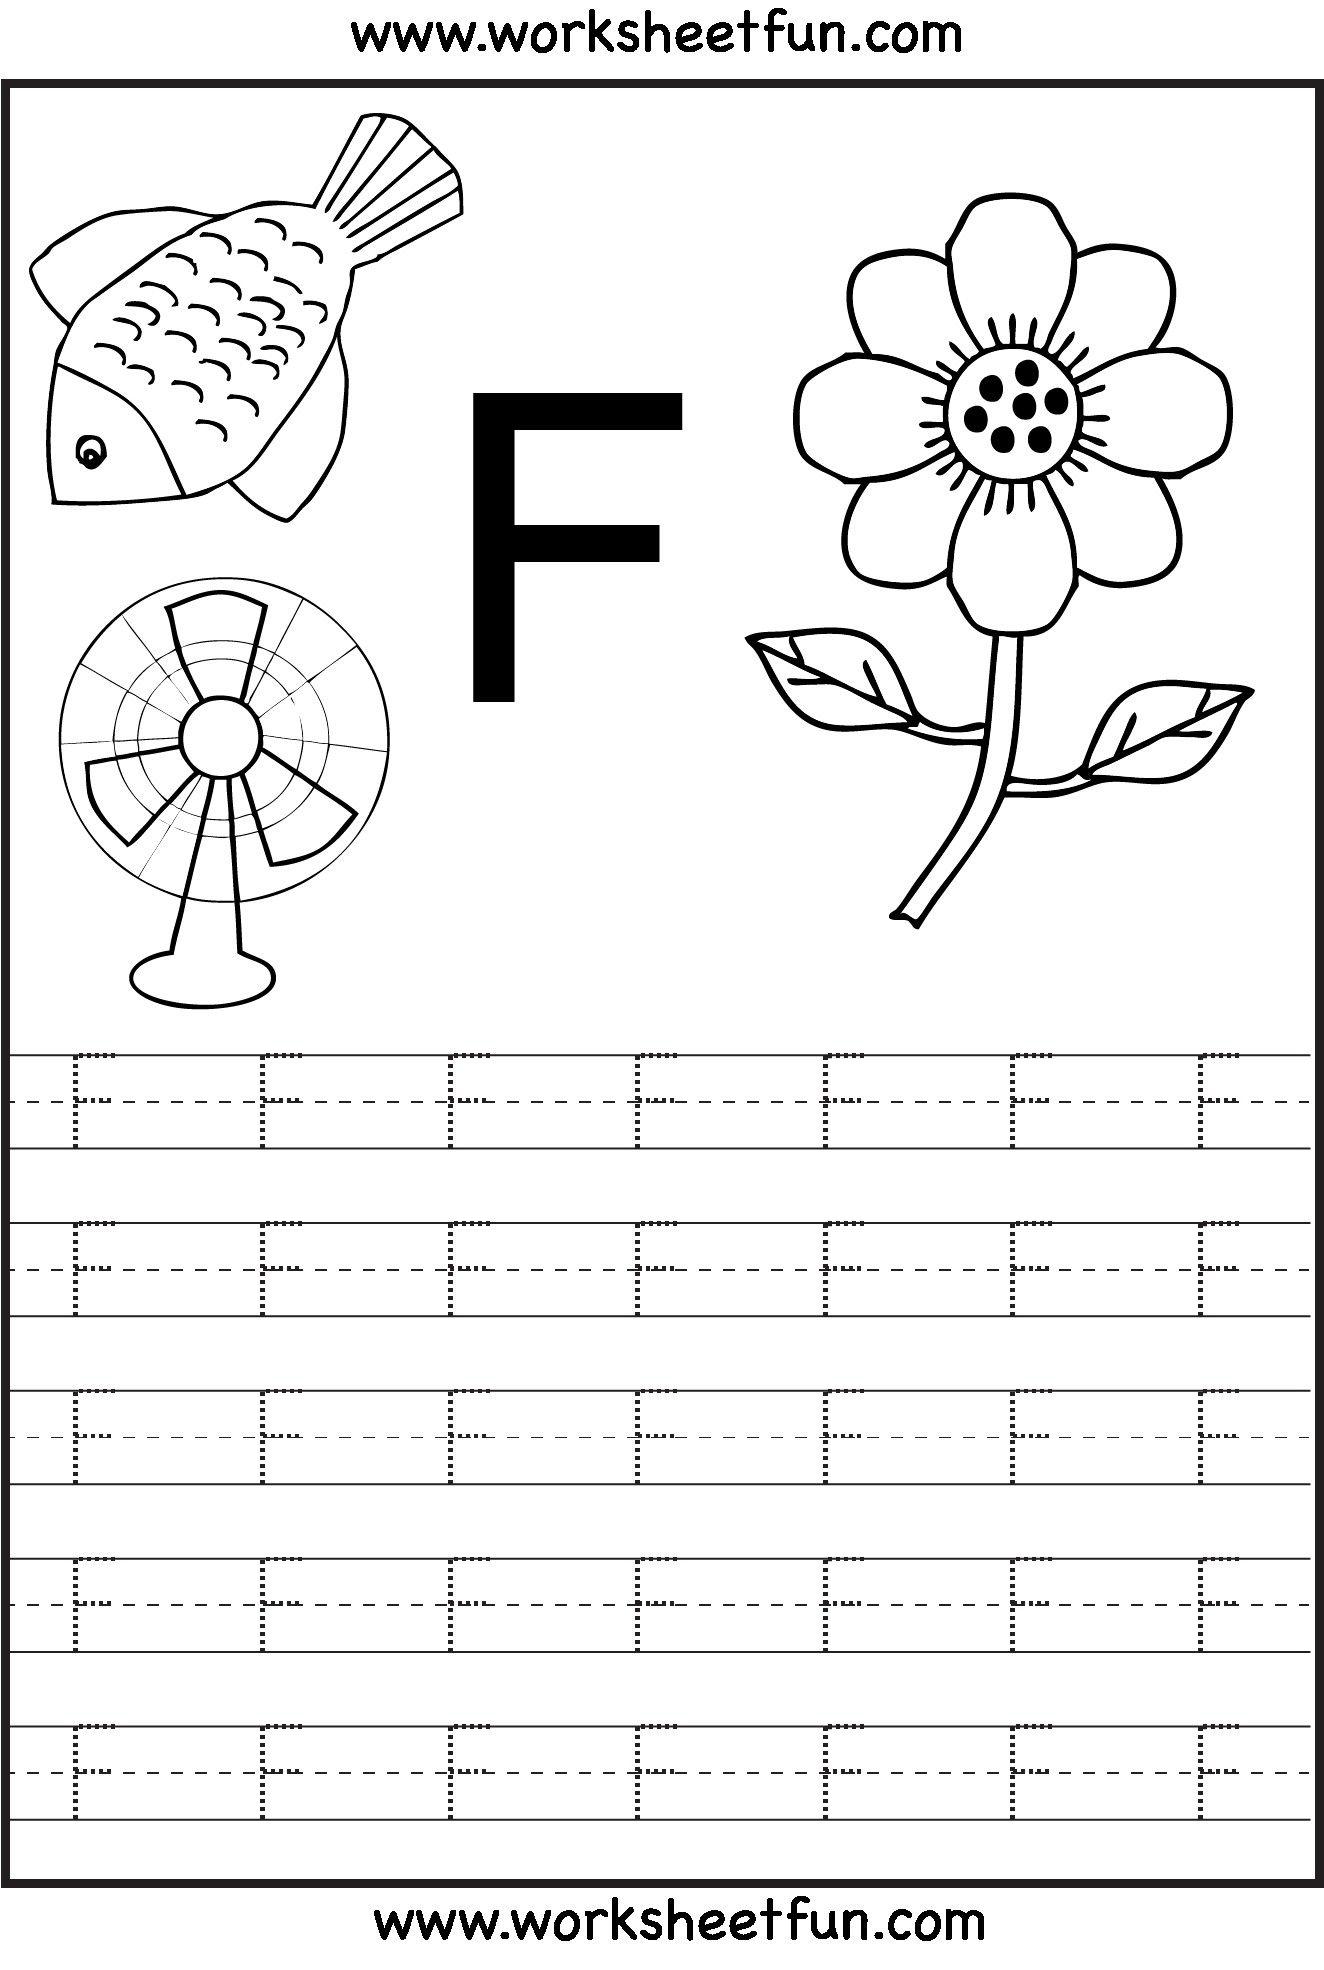 4 Worksheet Free Preschool Kindergarten Worksheets Letters Alphabet Printin Alphabet Writing Worksheets Letter Tracing Worksheets Alphabet Worksheets Preschool [ 1970 x 1324 Pixel ]